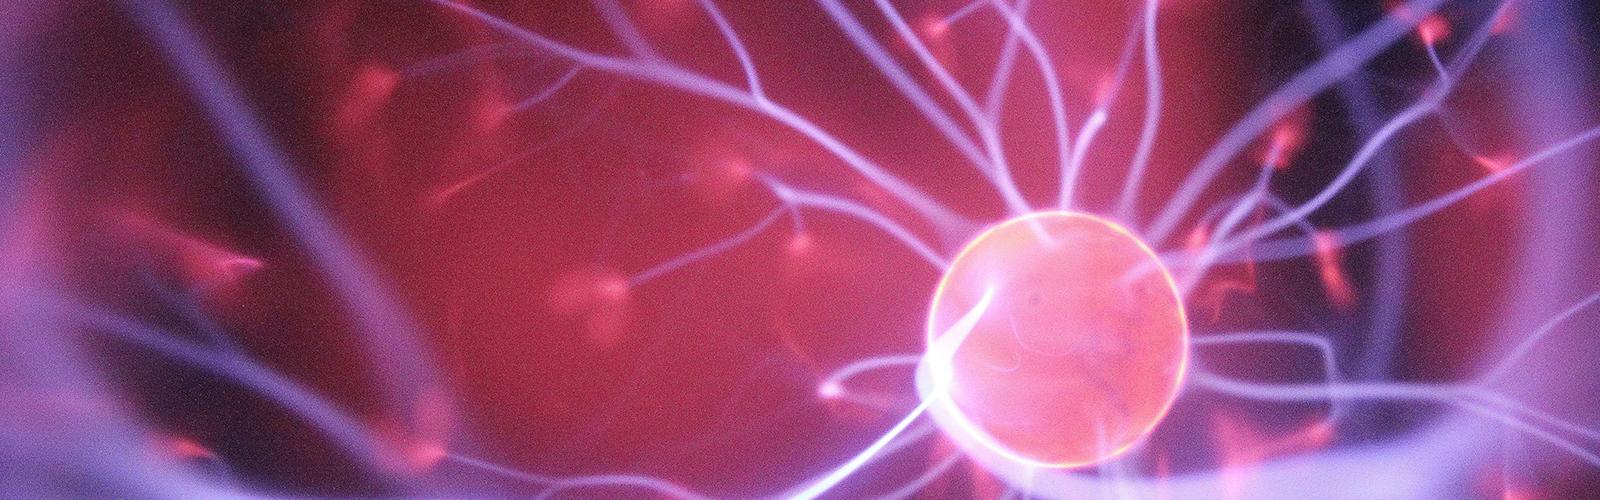 Pink and Purple Plasma Ball